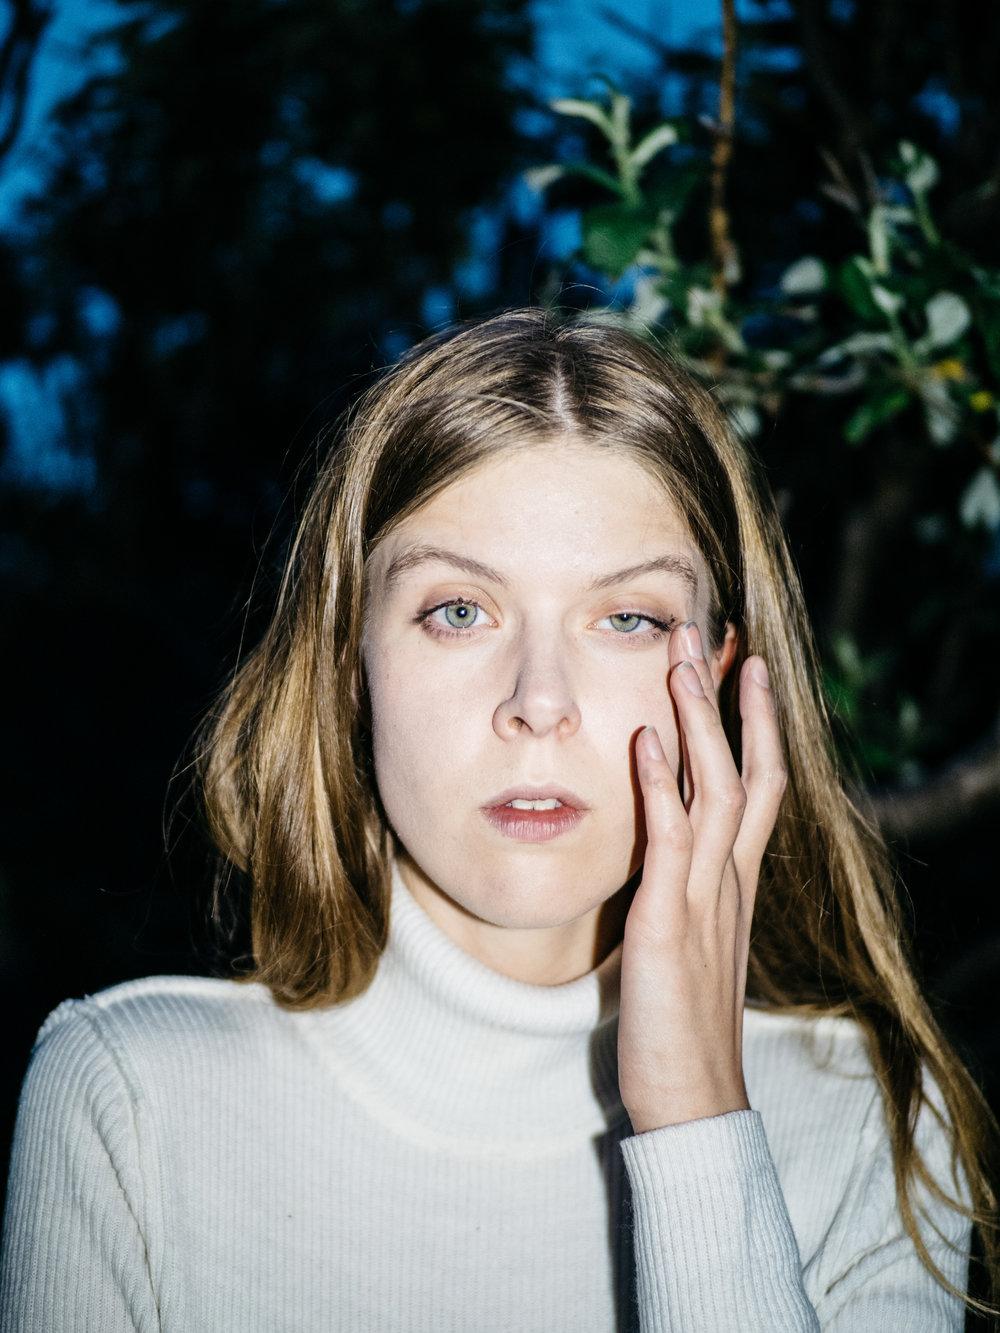 photograph by Gabrielle Motola